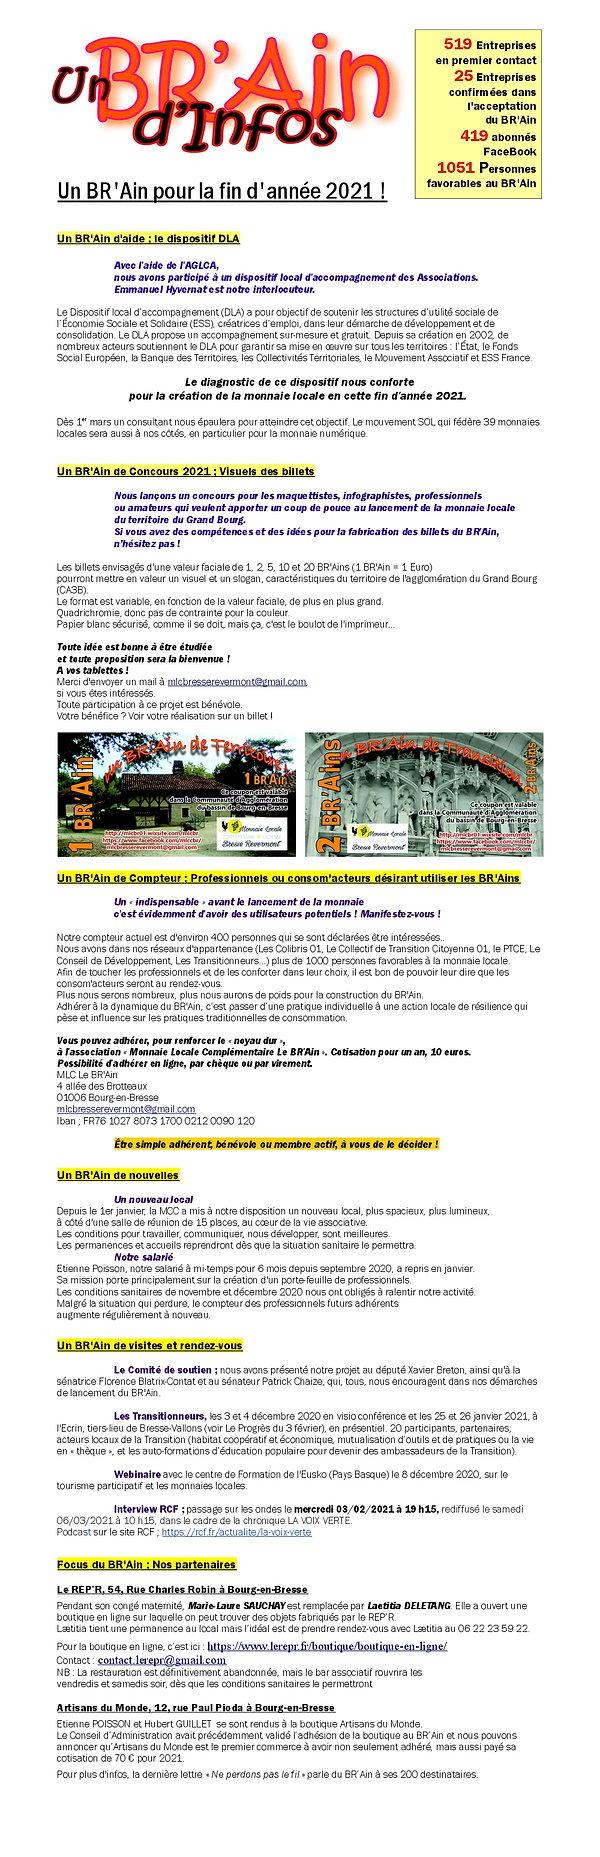 UN BRAIN D'INFOS N°2 (1).jpg